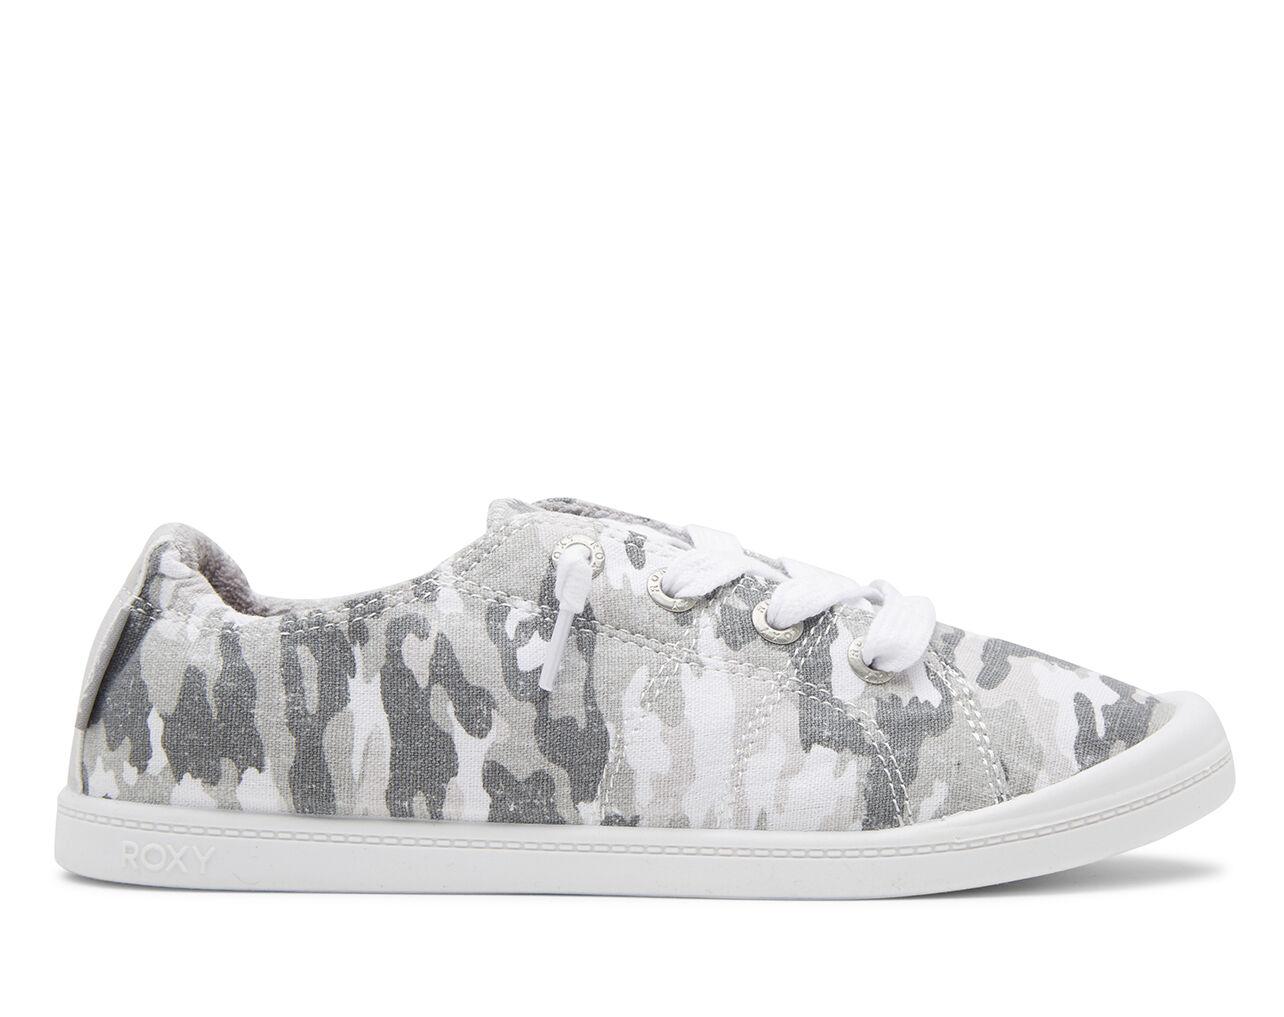 Women's Roxy Bayshore Slip-On Sneakers